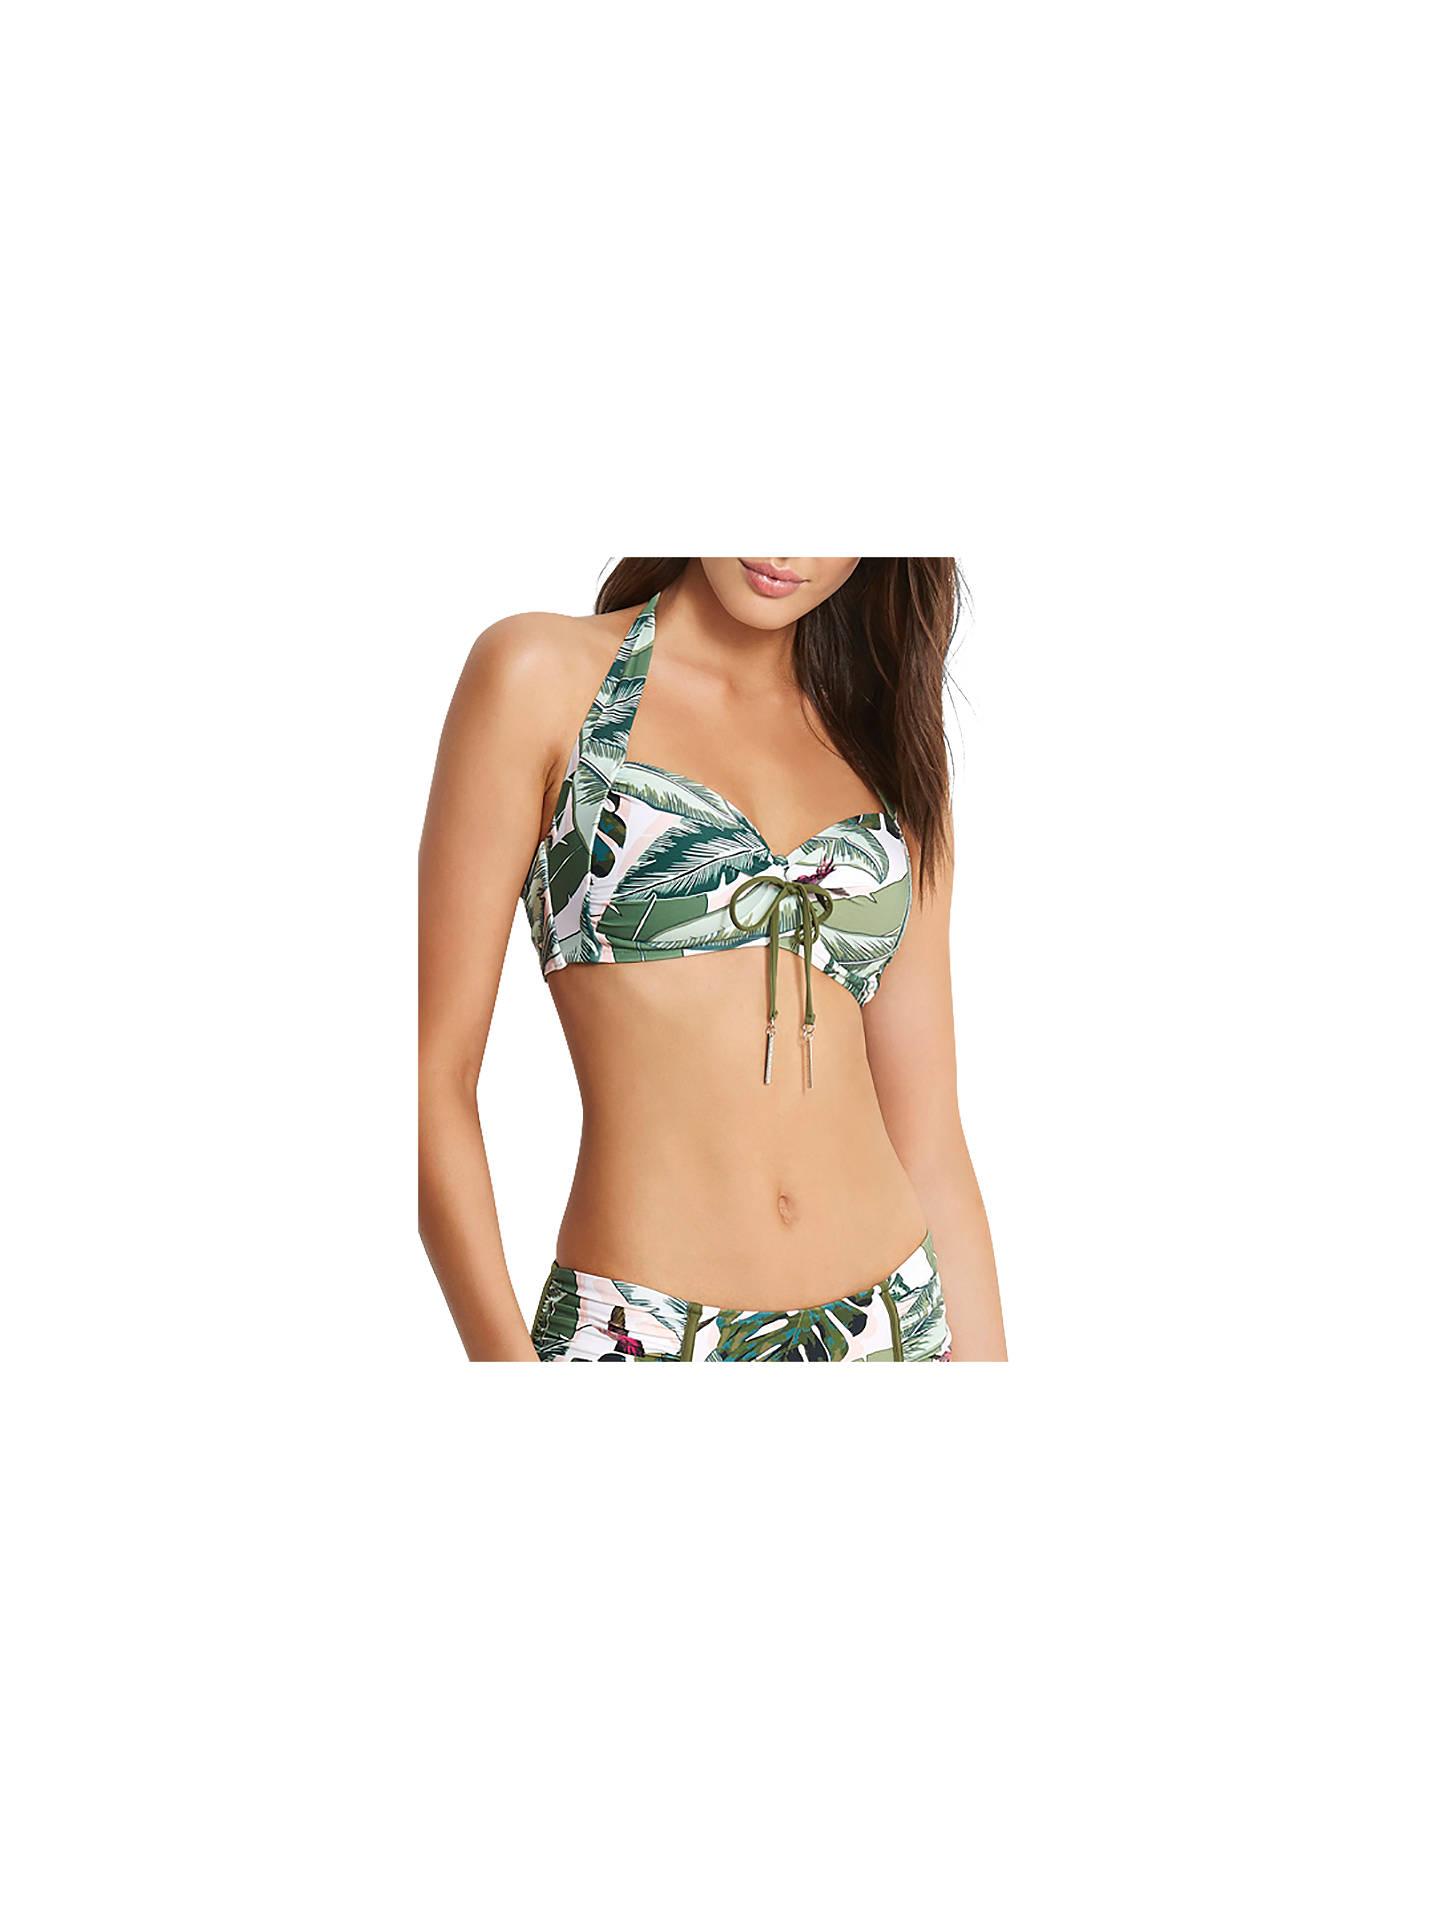 6a21a683e67ce BuySeafolly Palm Beach Soft Cup Halter Bikini Top